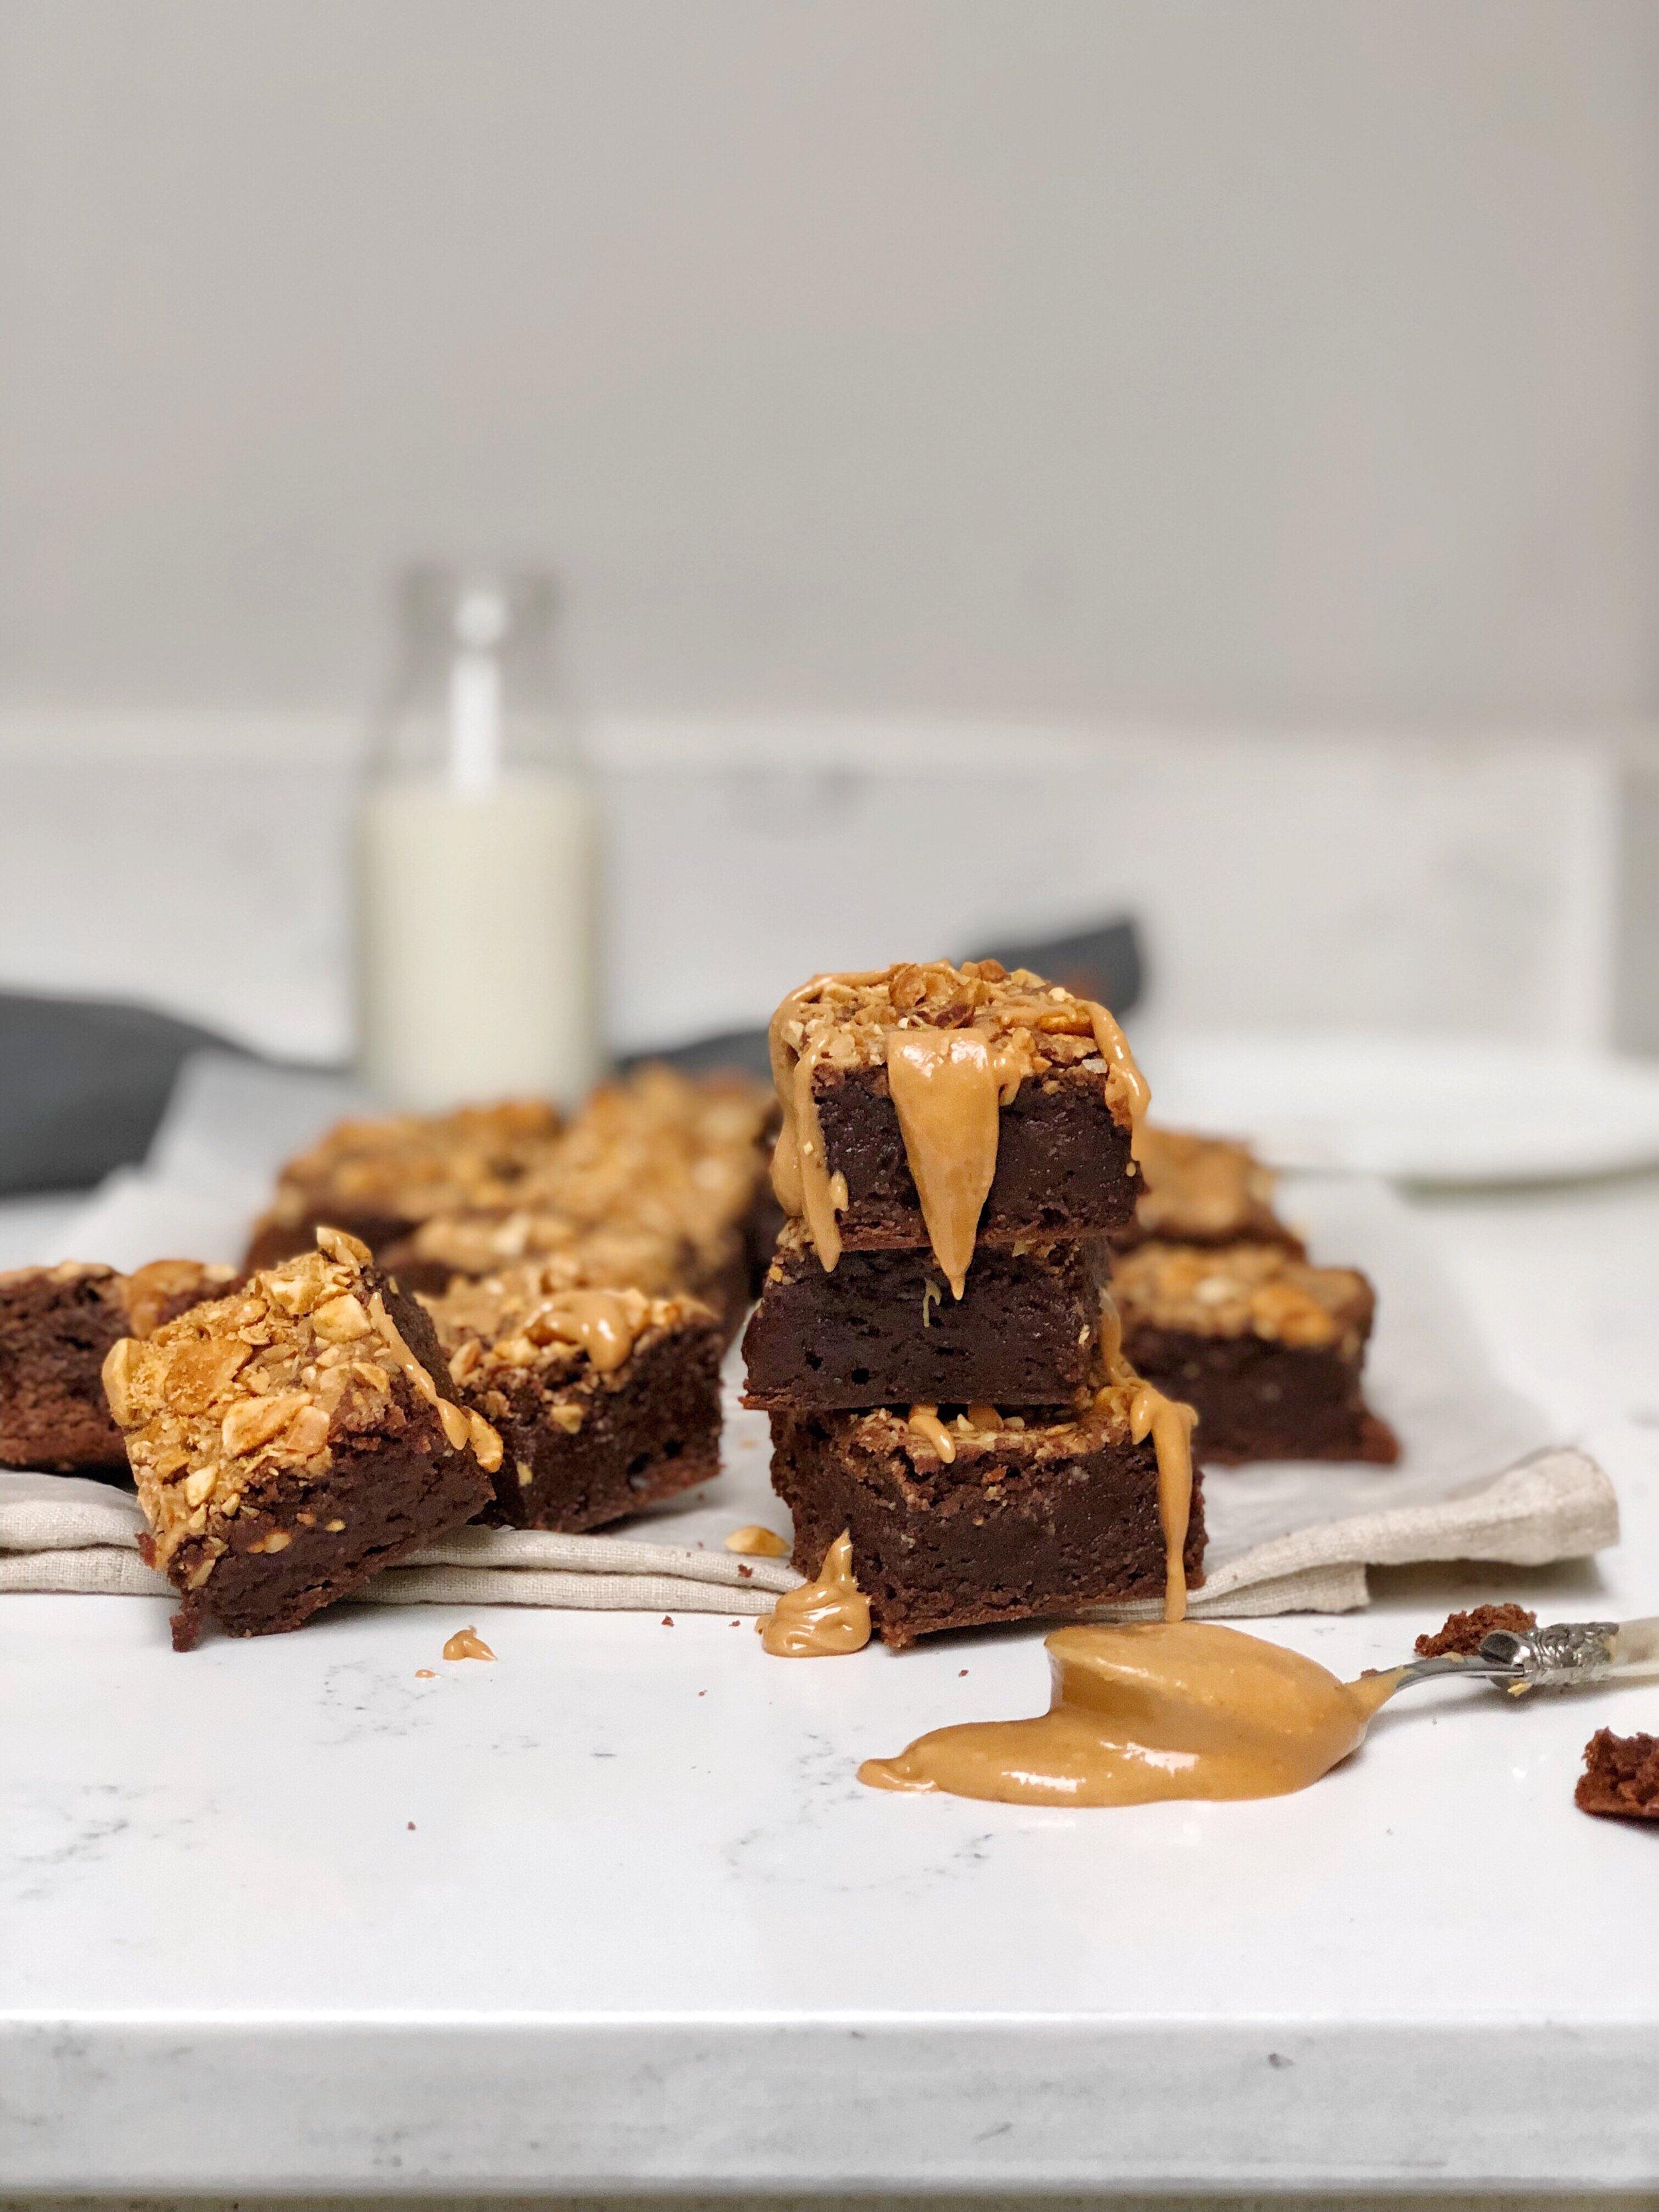 Tom Kerridge Peanut butter brownies